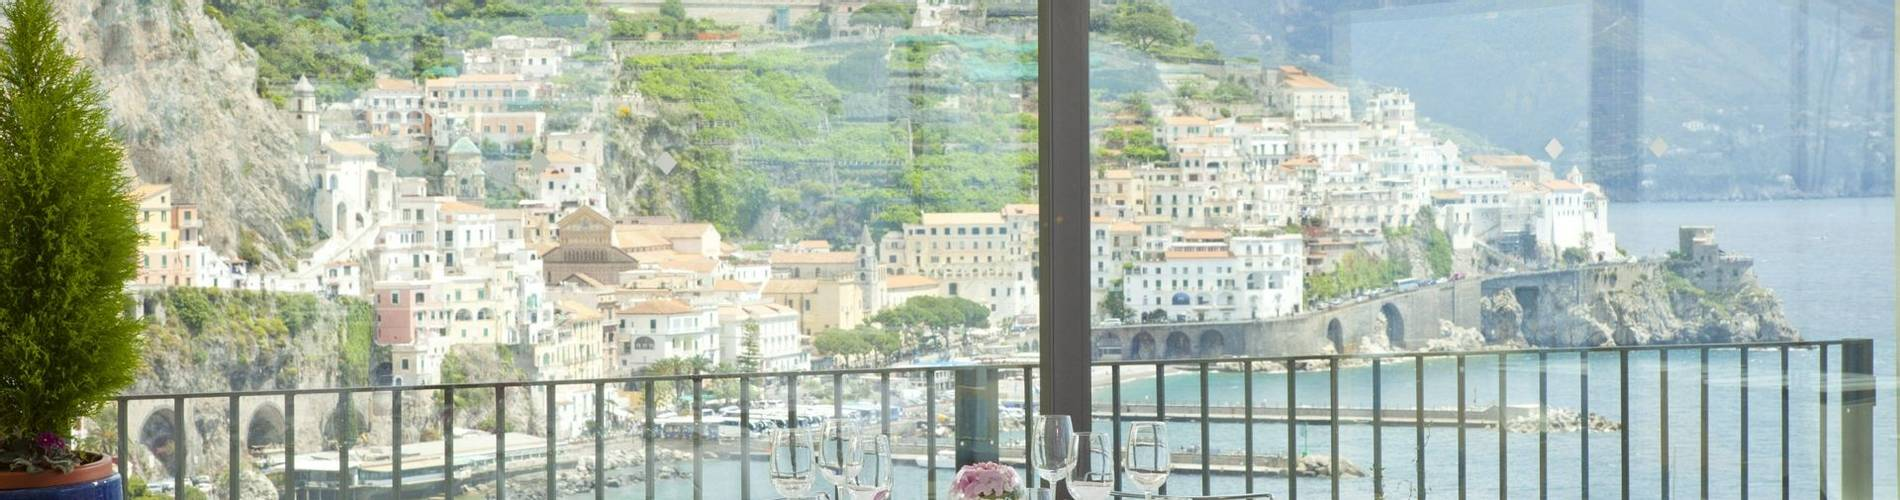 Miramalfi, Amalfi Coast, Italy (3).jpg